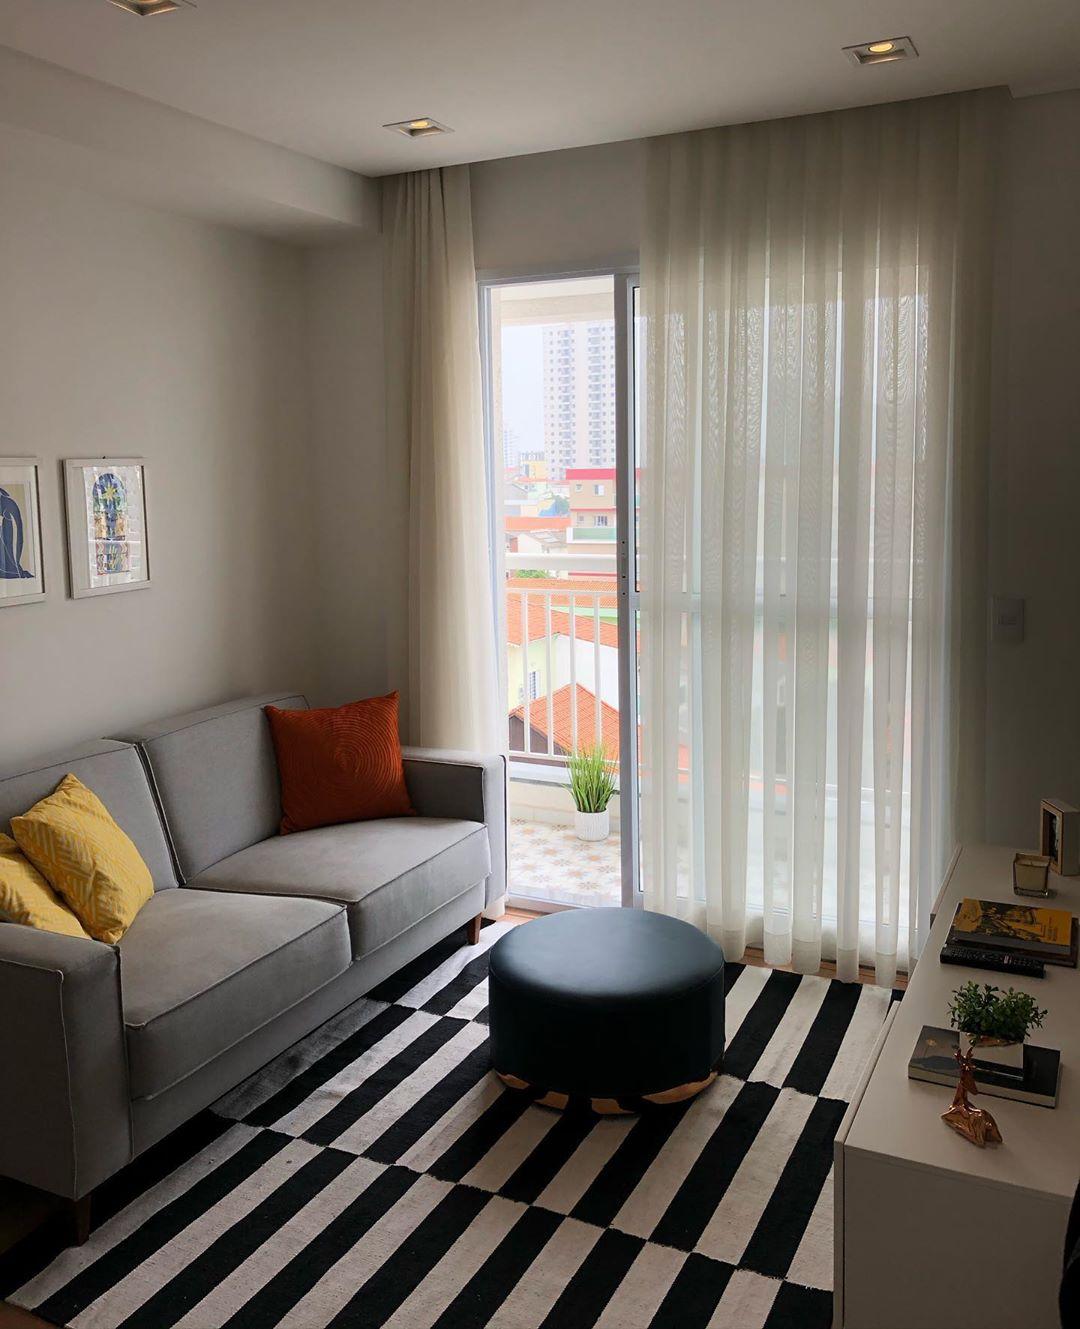 sala simples com sofa cinza